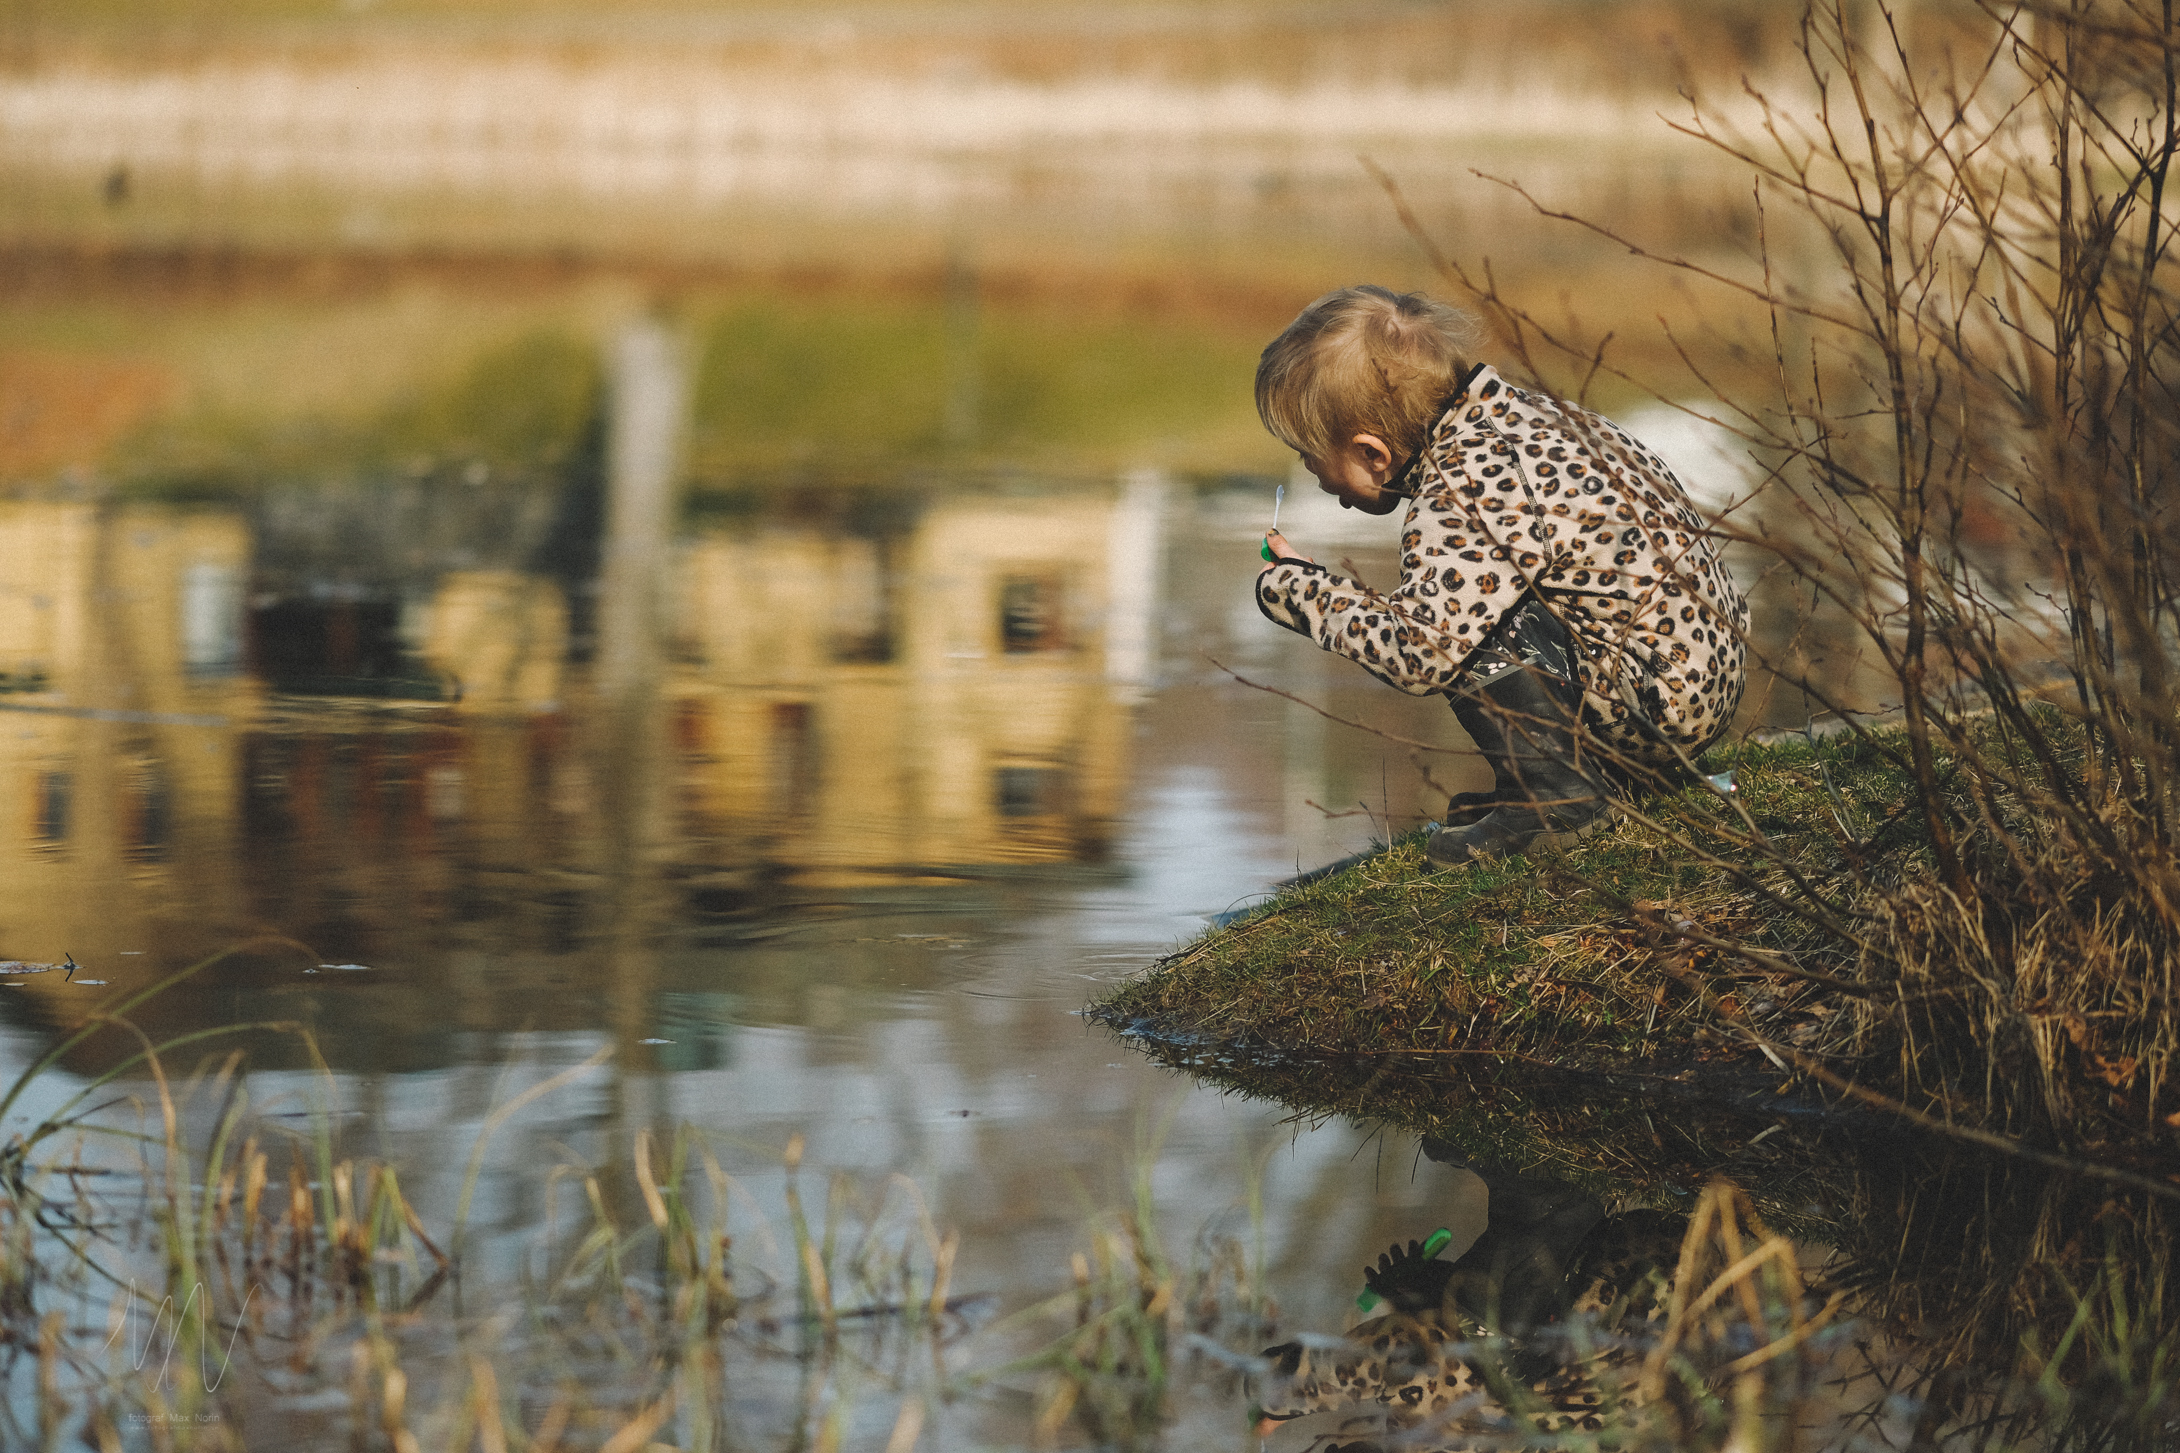 barnfoto-Fotograf-Max-Norin-Borås-6.jpg